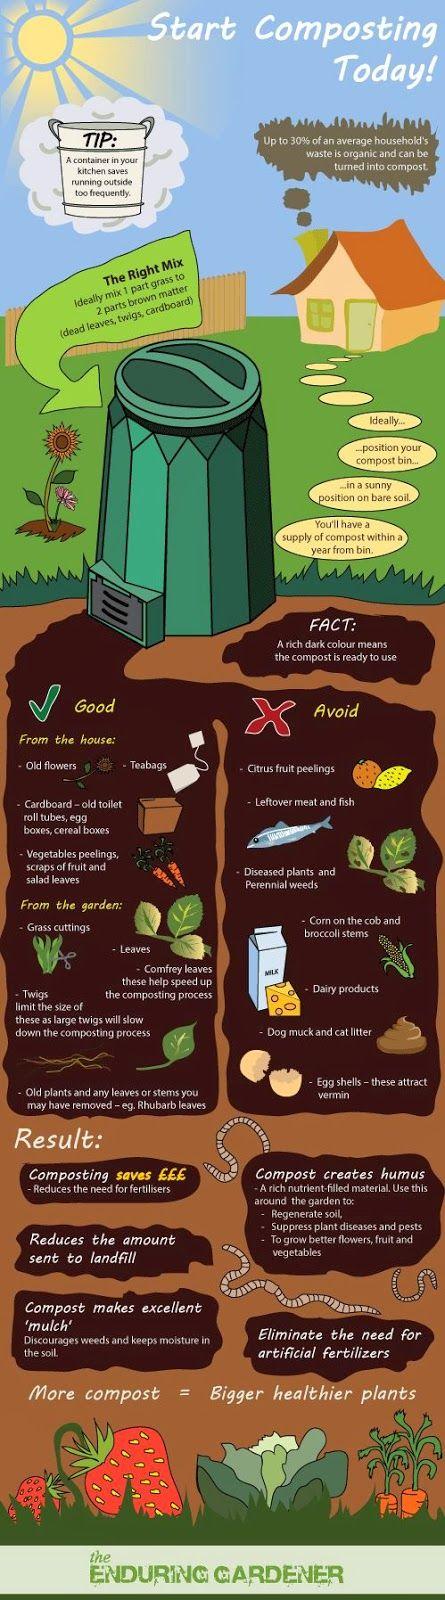 Alternative Gardening: Start Composting Today